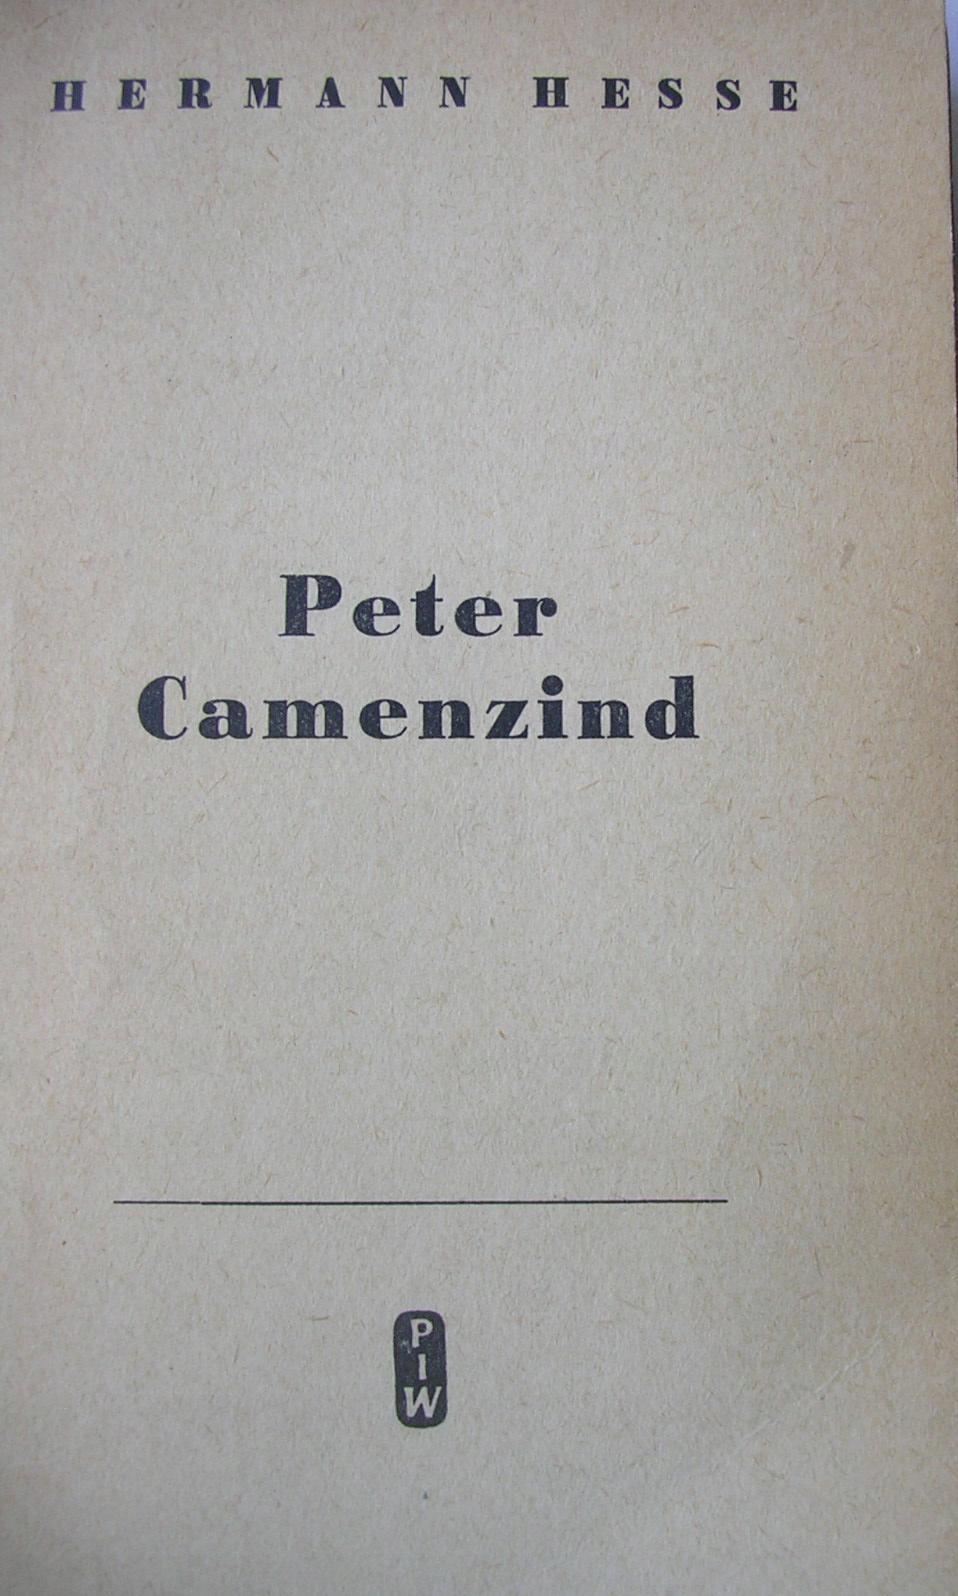 Peter Camenzind - Hermann Hesse 1957, wyd. I